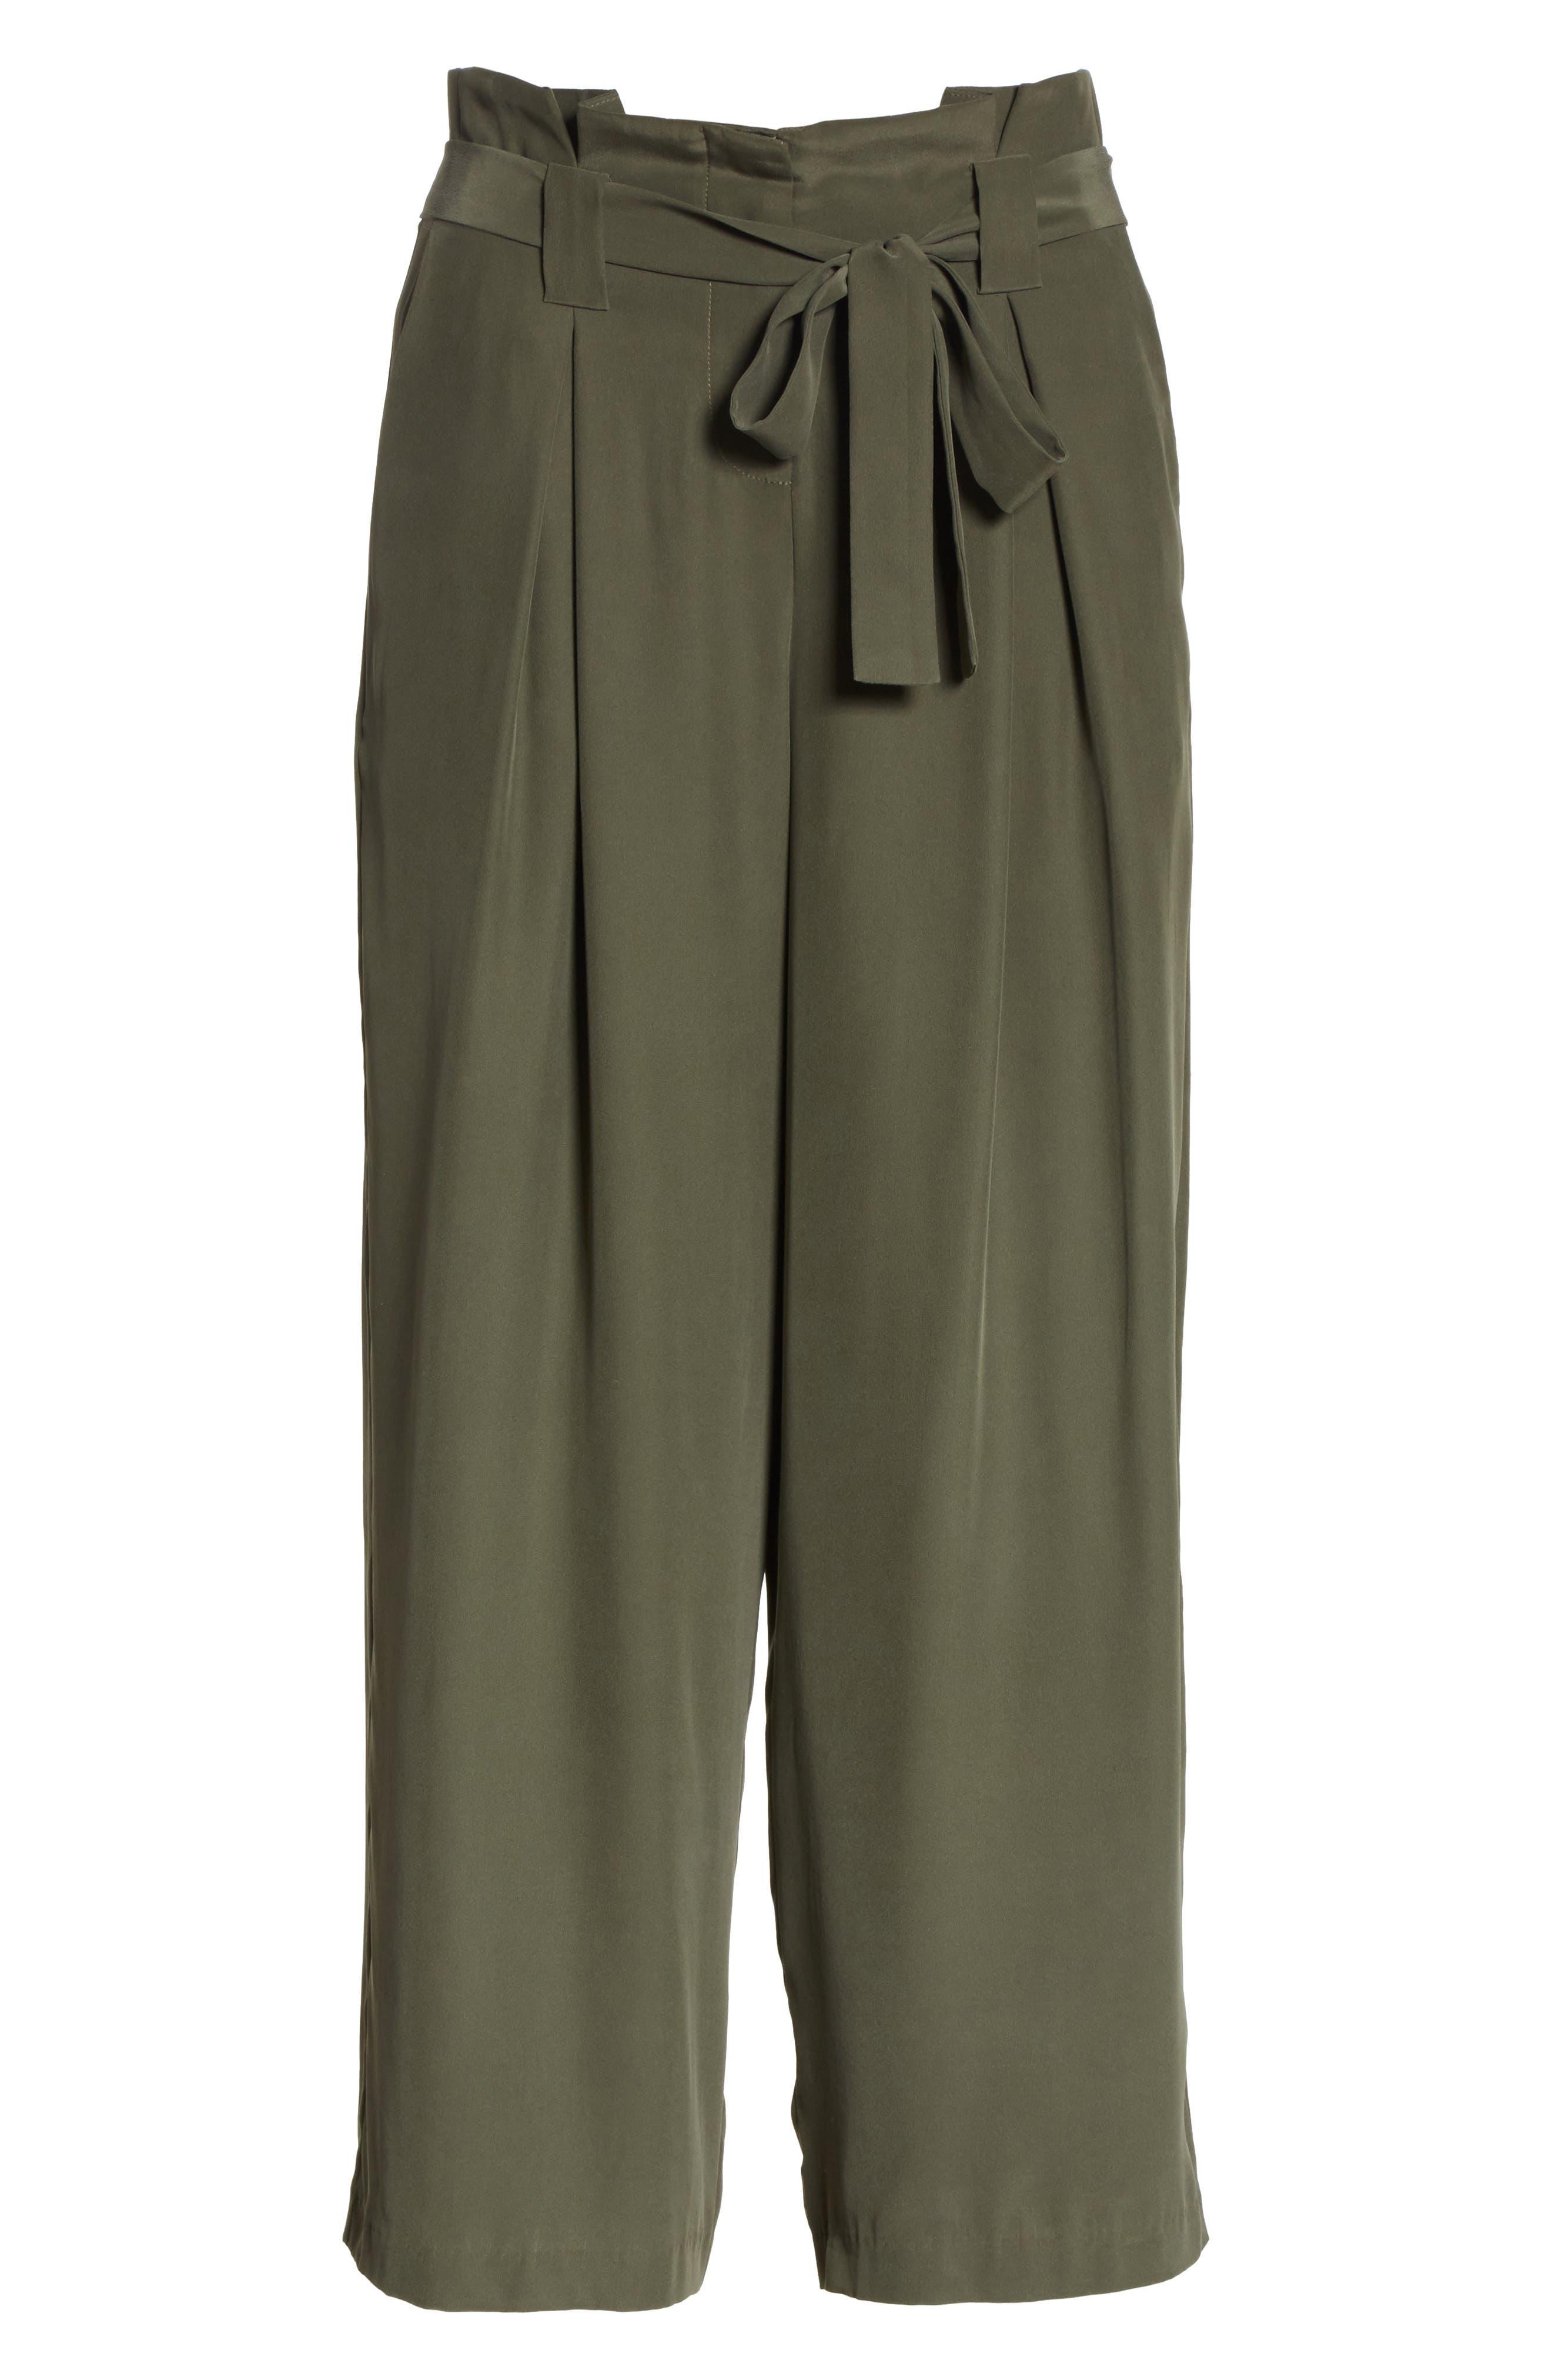 Samira Paperbag Wide Leg Pants,                             Alternate thumbnail 6, color,                             300